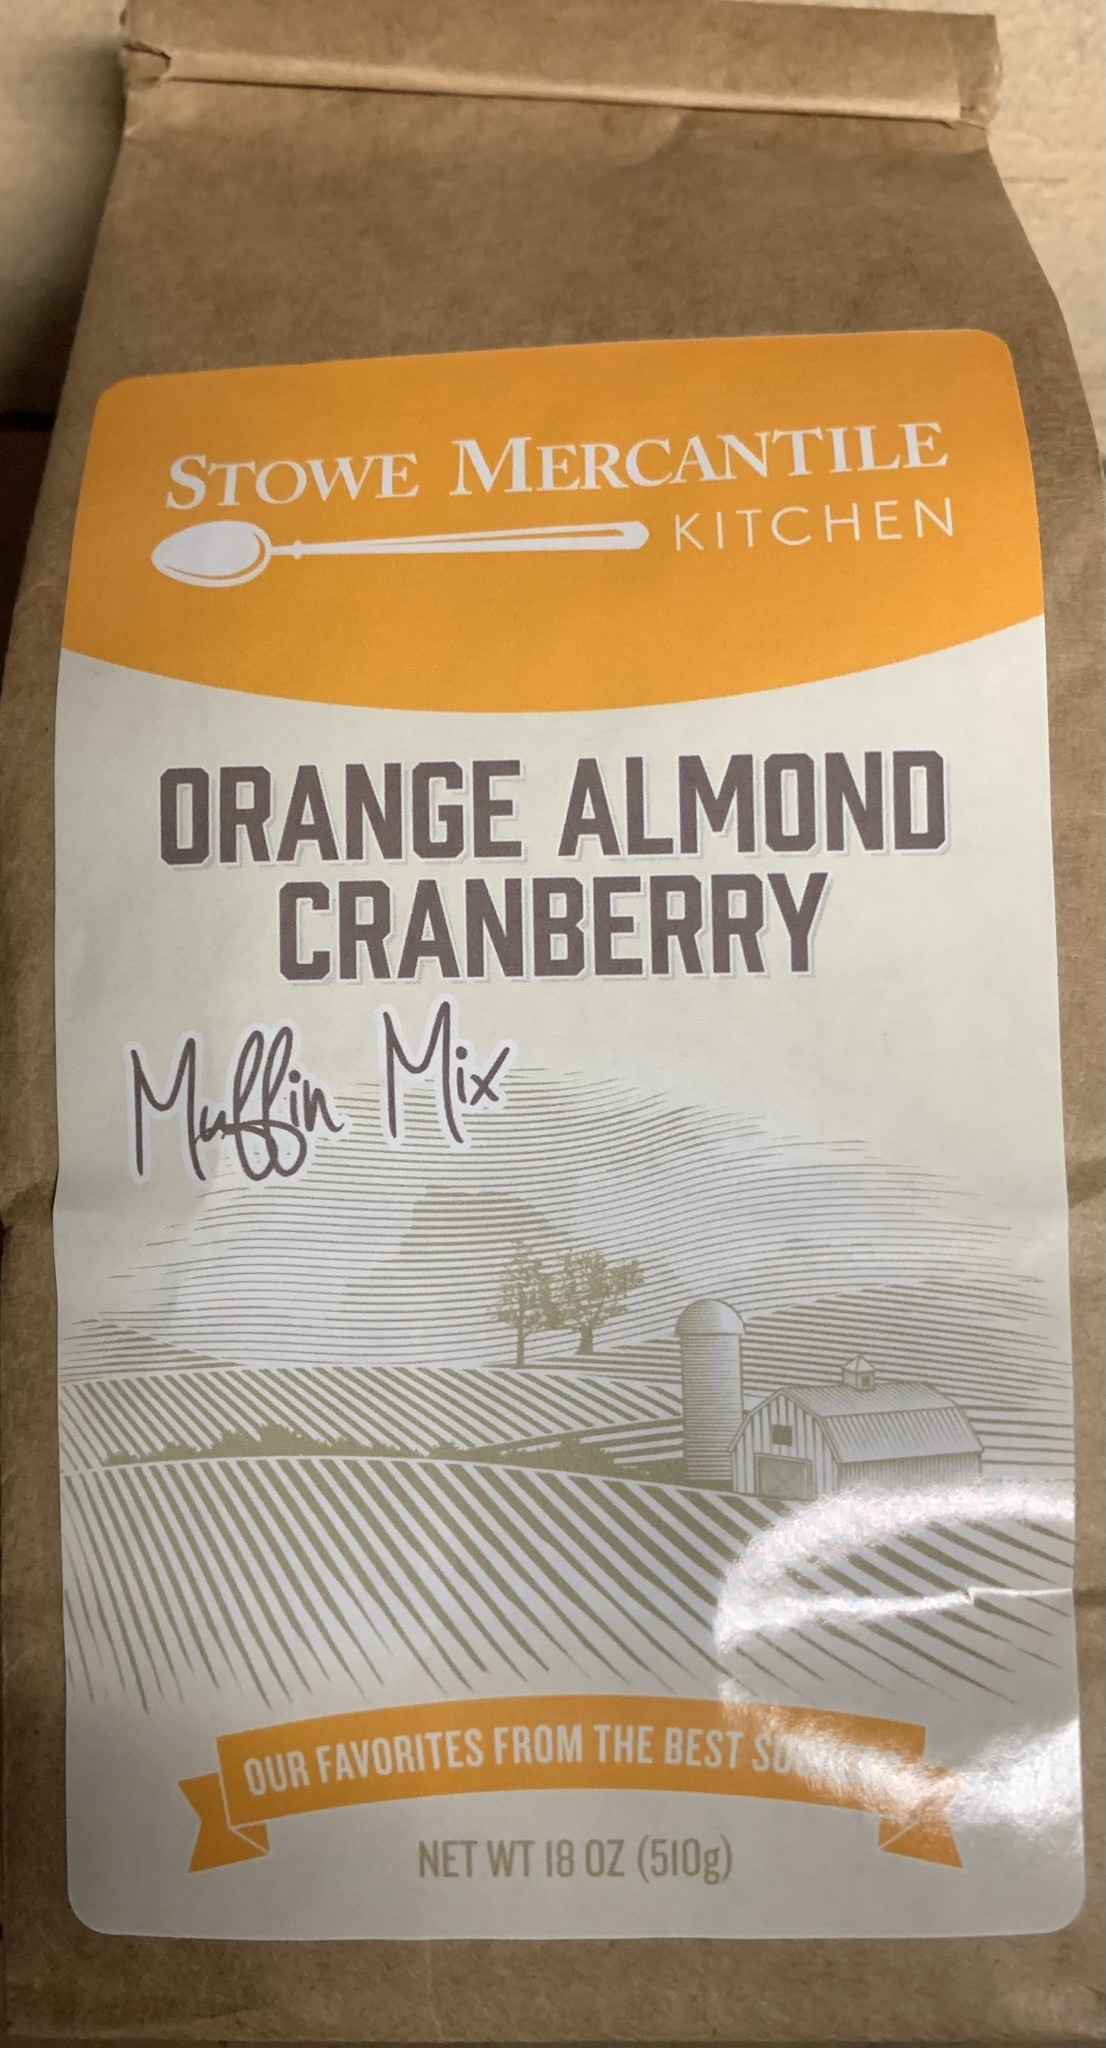 Stowe Mercantile Kitchen Muffin Mix Orange Almond Cranberry